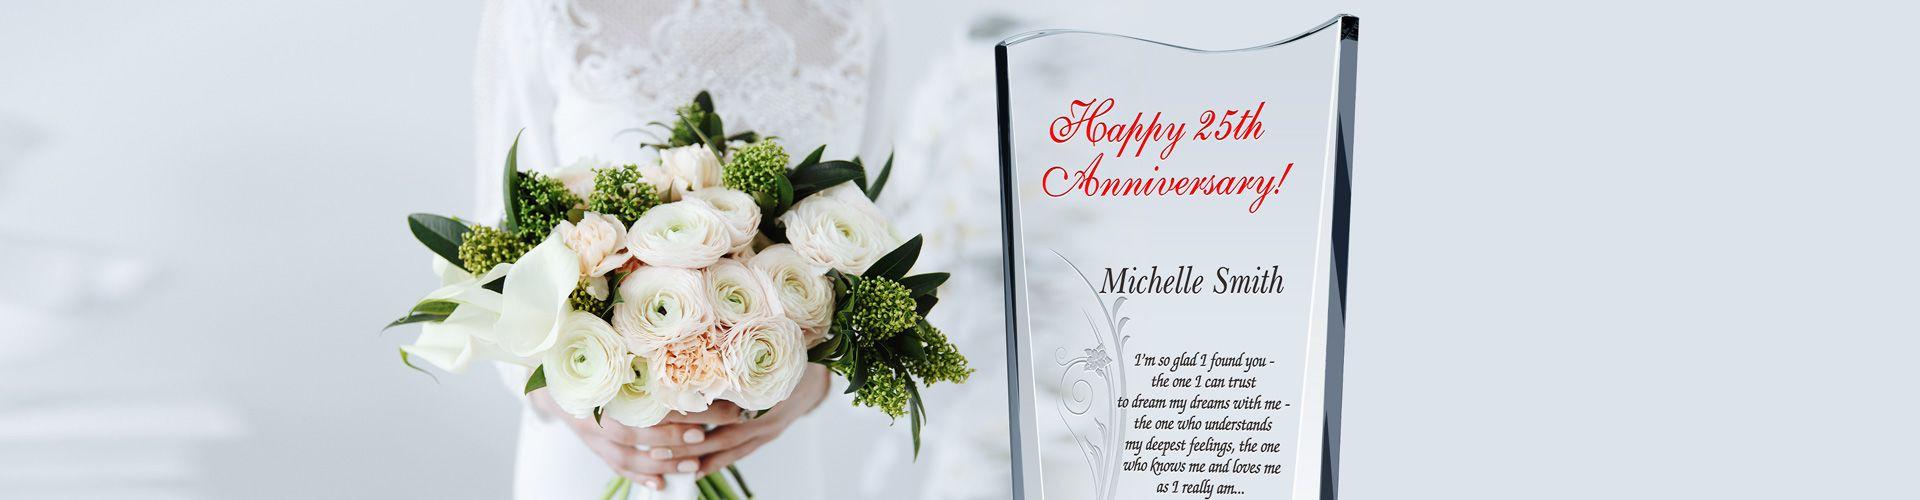 25th Wedding Anniversary Wording Ideas And Sample Layout Diy Awards